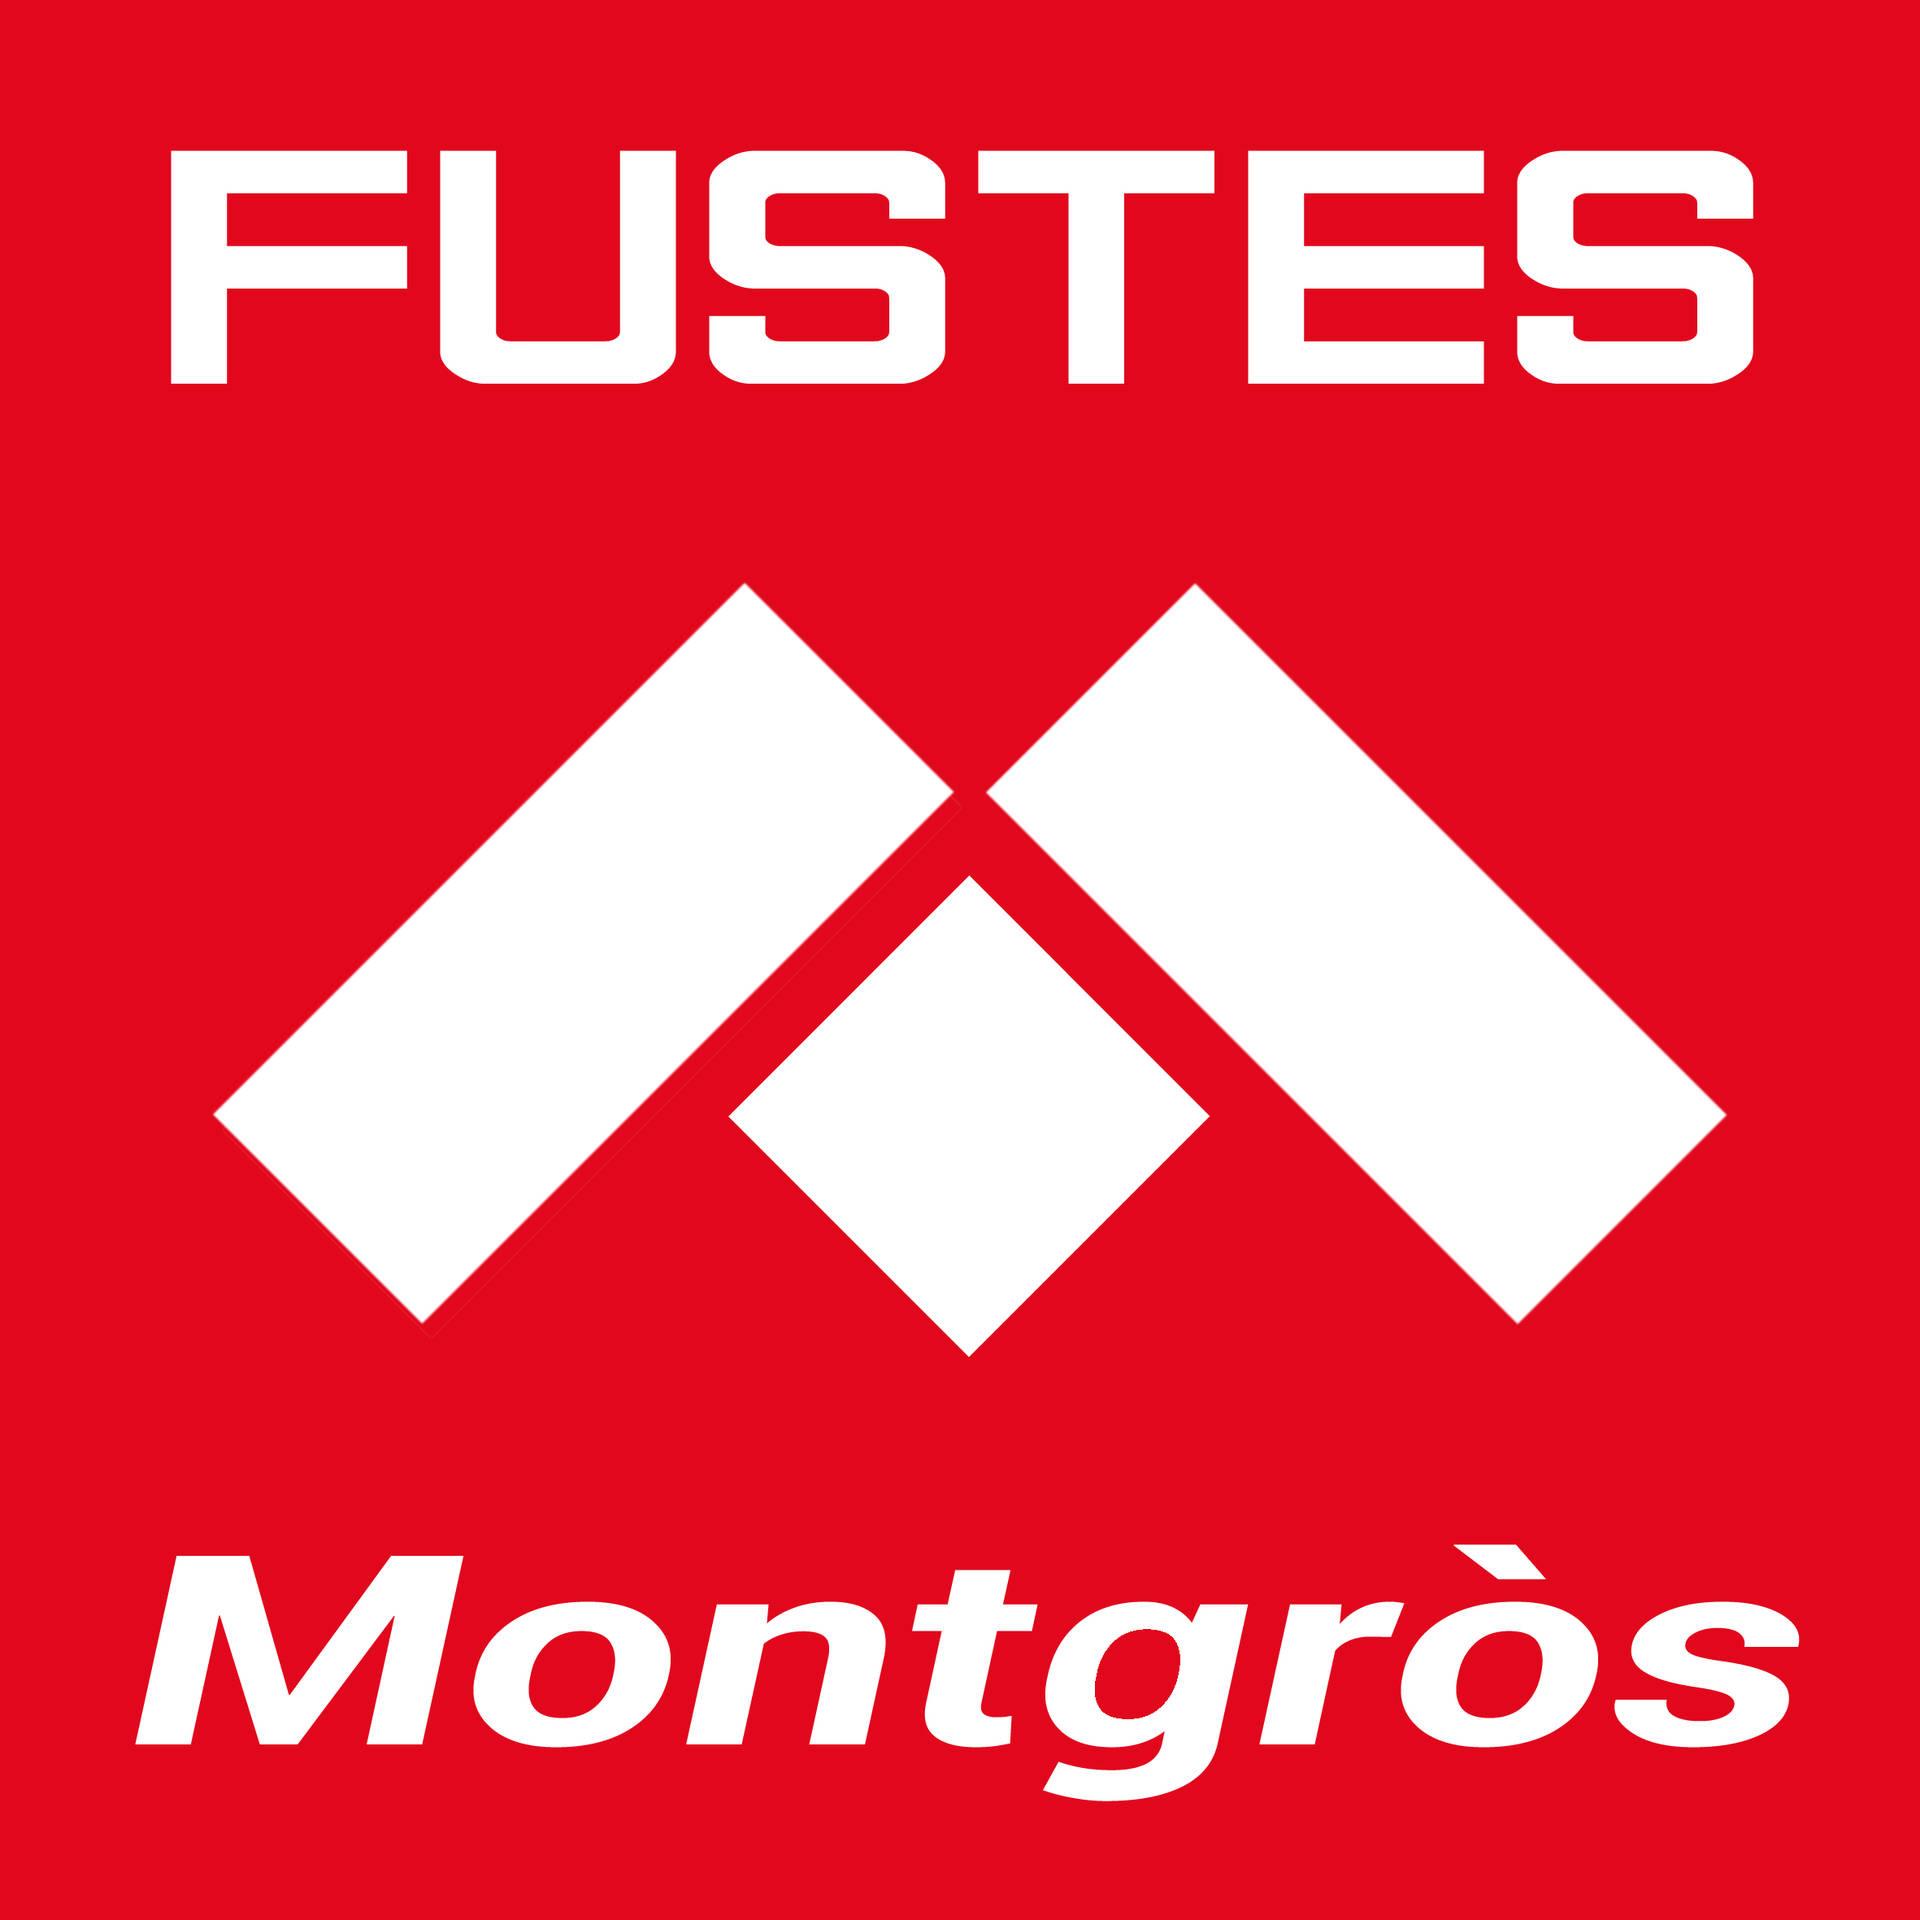 FUSTES MONTGROS S.L.